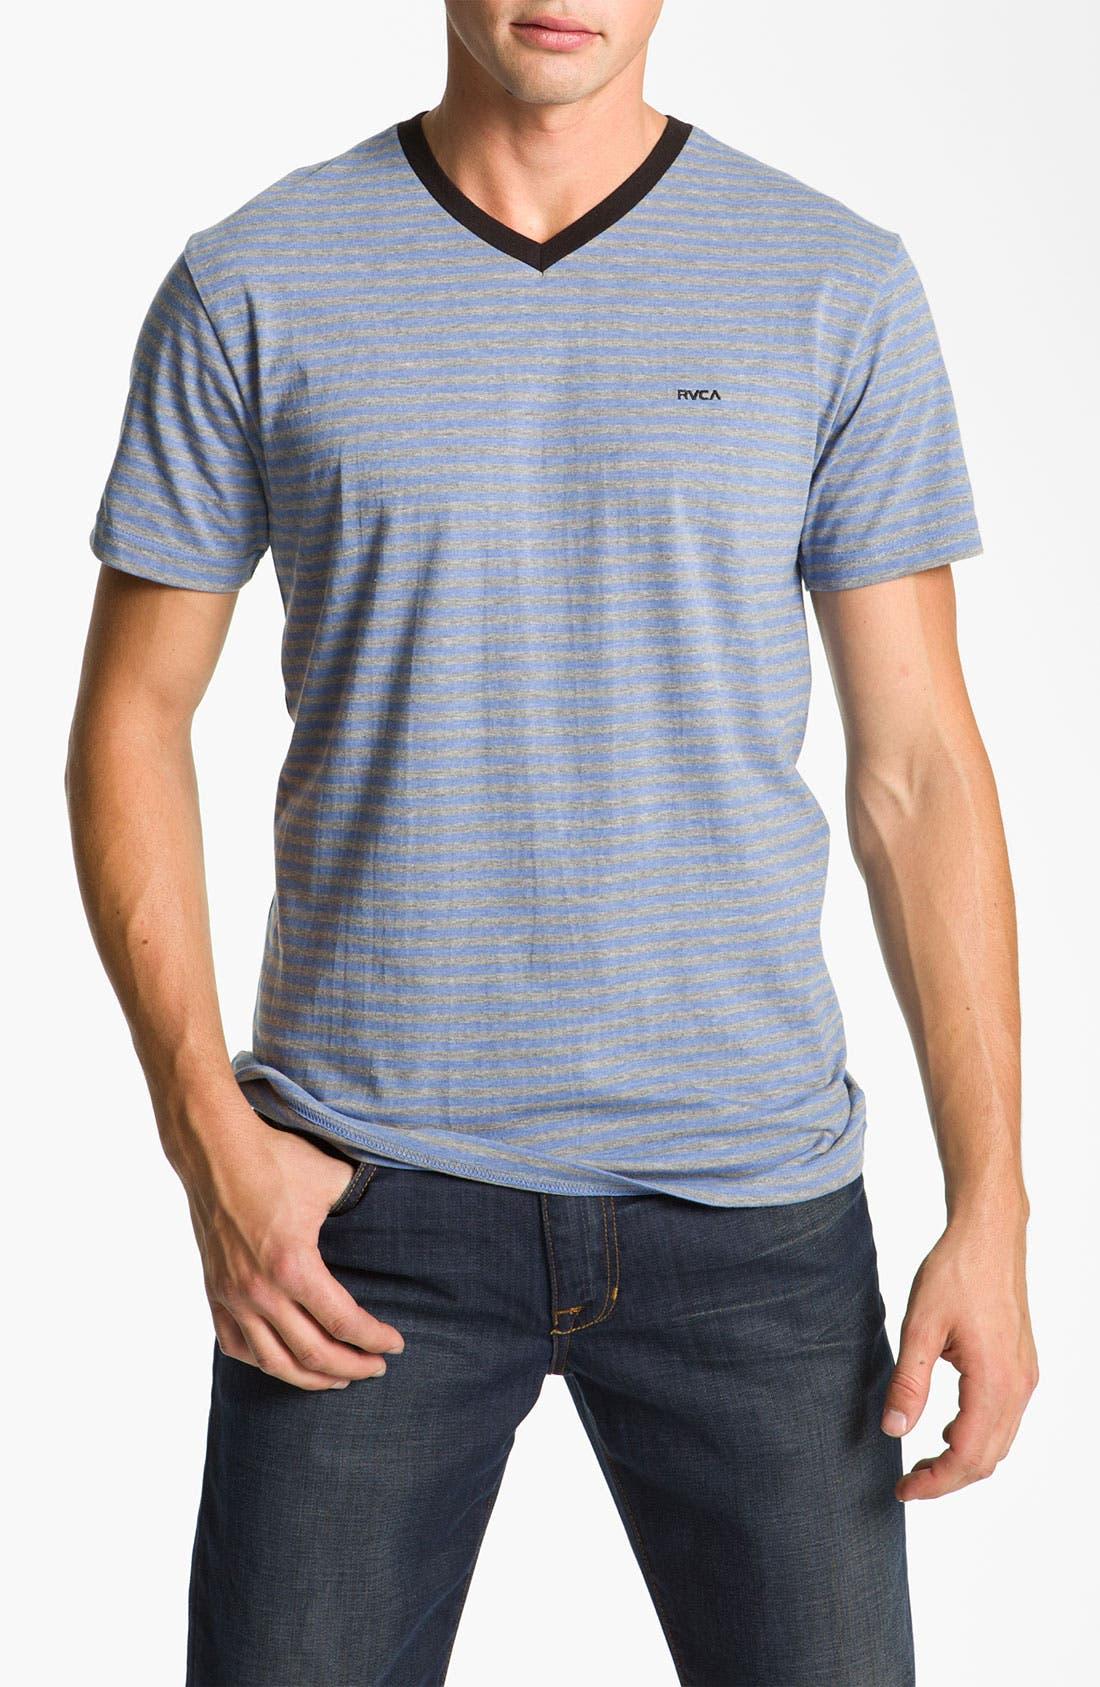 Main Image - RVCA 'Grain' Trim Fit V-Neck T-Shirt